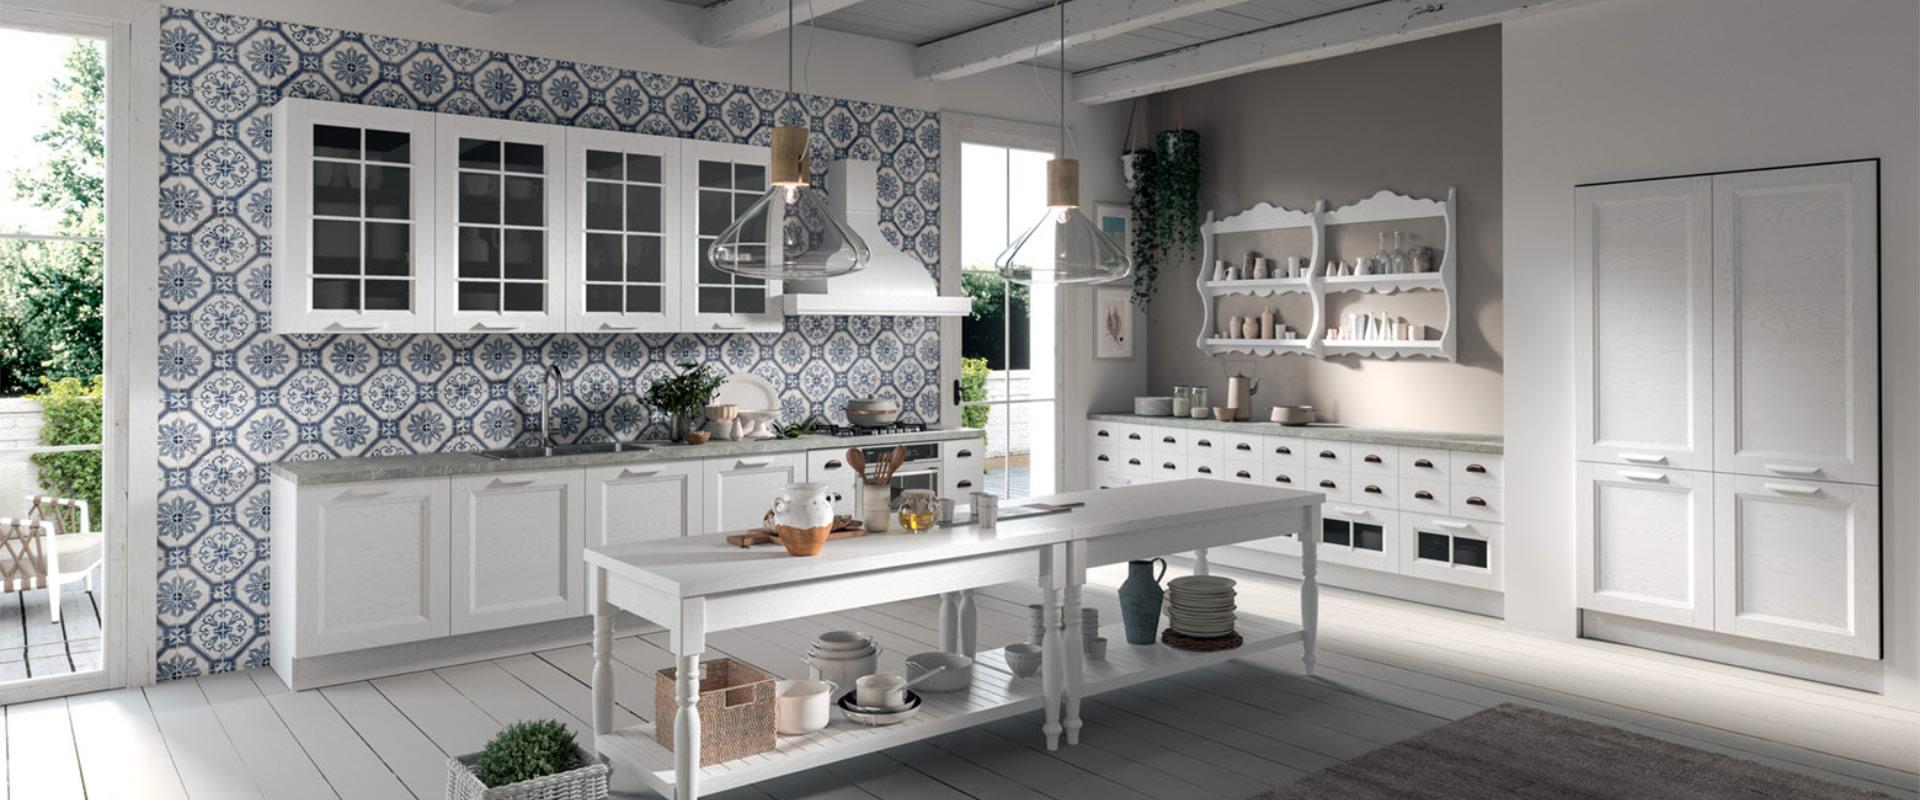 Cucine Componibili Trieste.Cucina Ylenia Trieste Aran Cucine